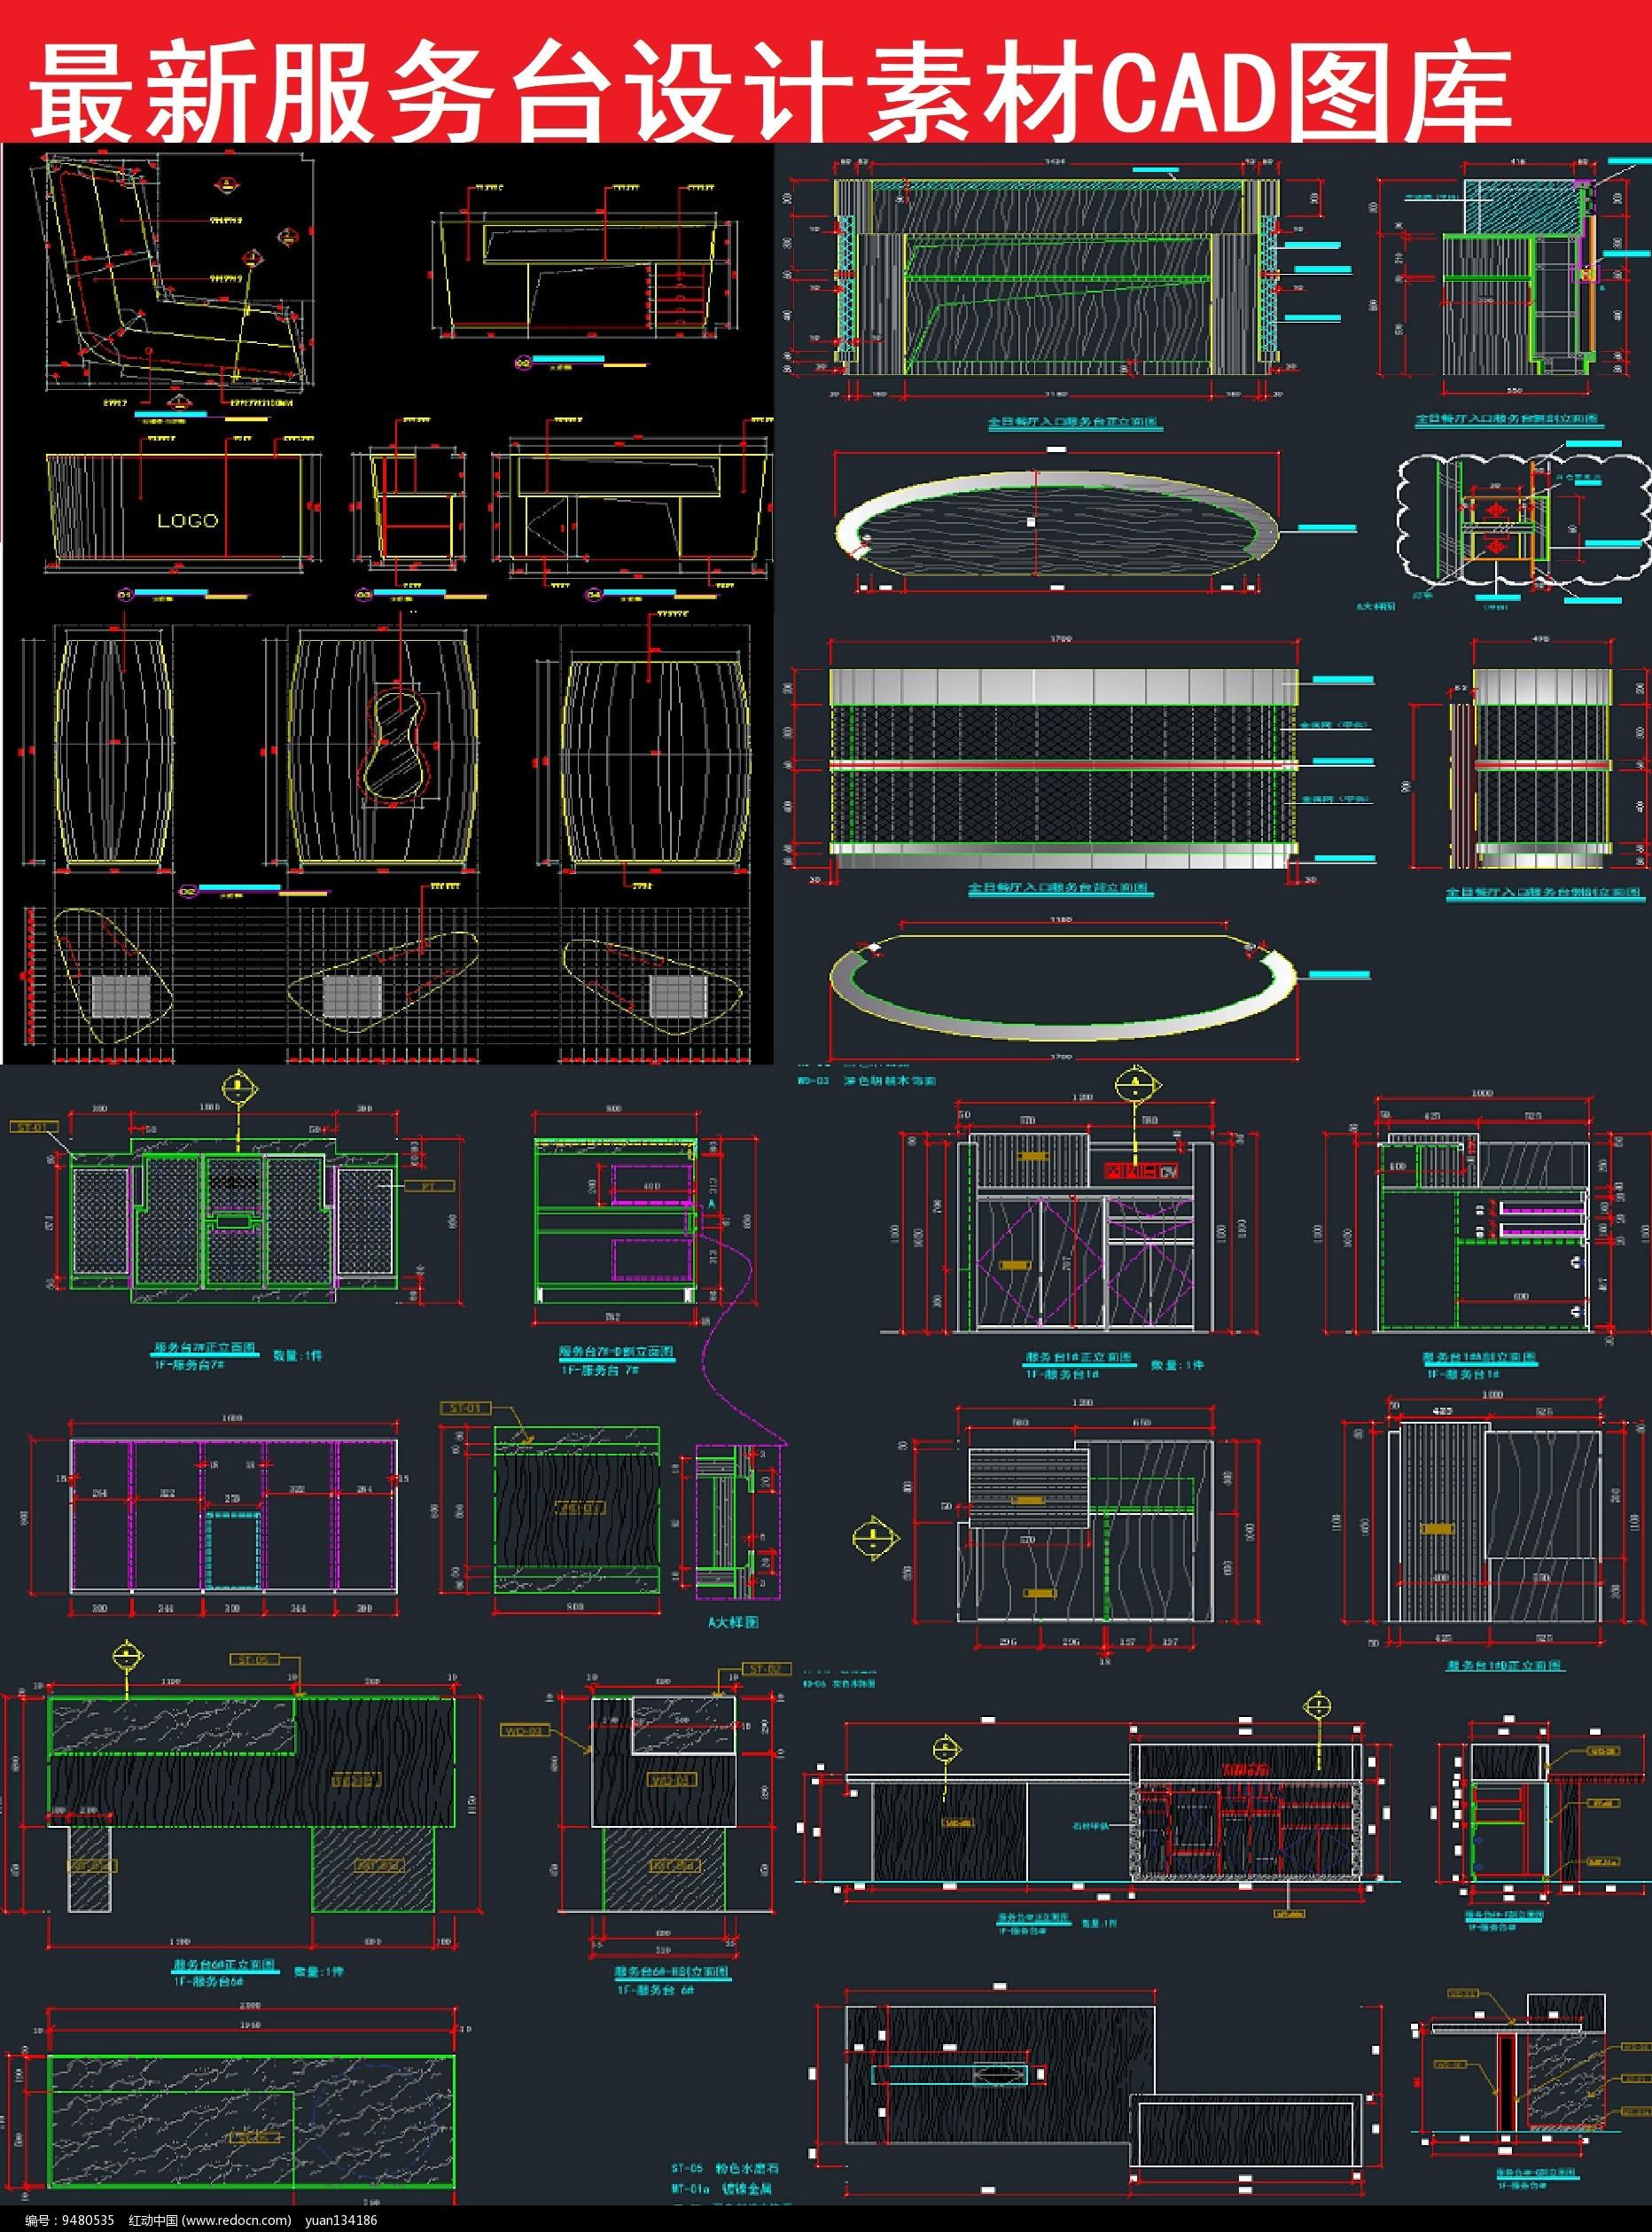 服务台CAD图库caddxf圆弧图片